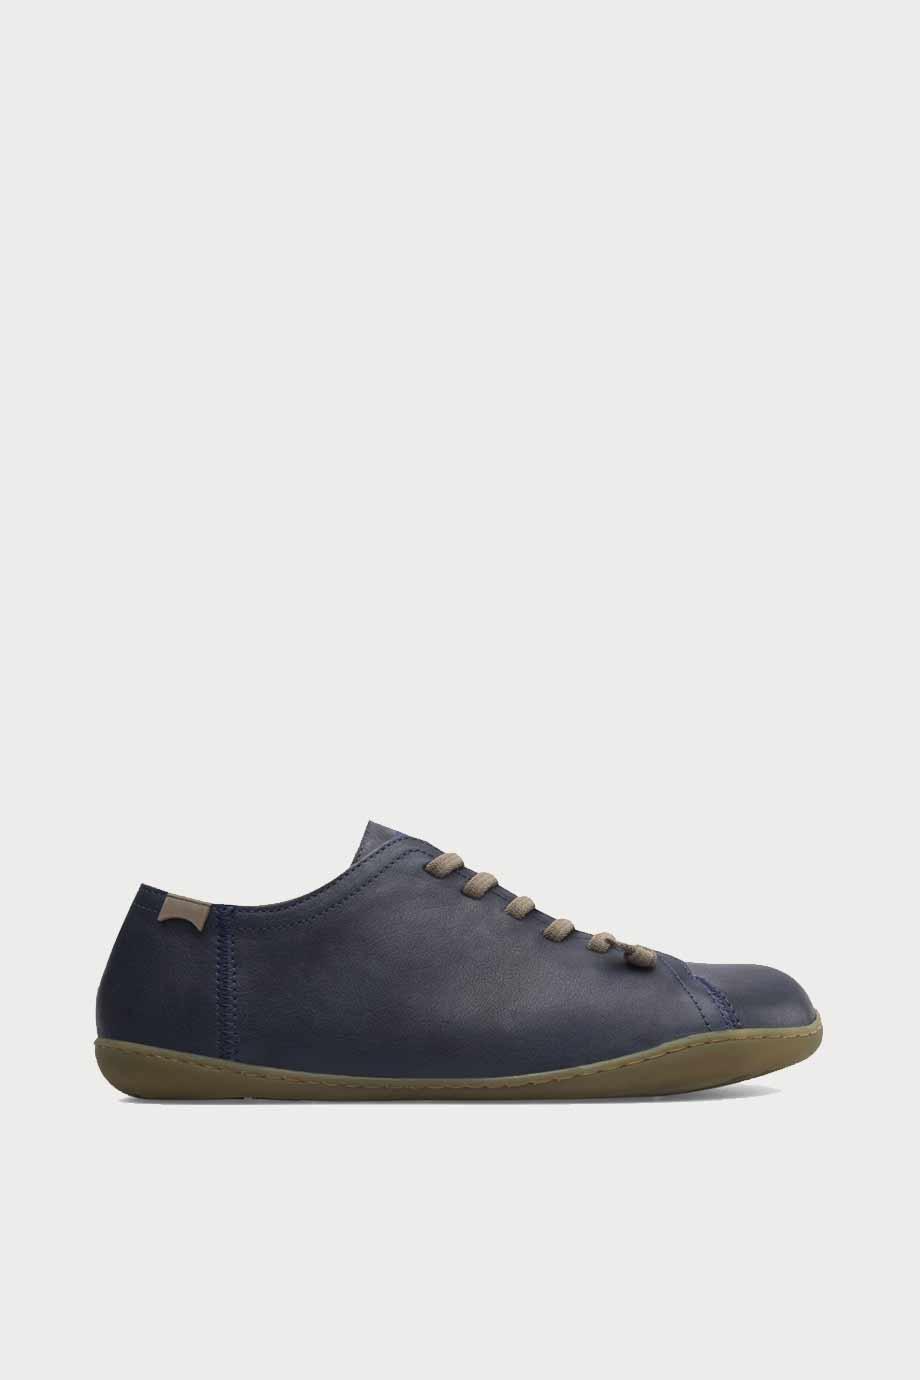 spiridoula metheniti shoes xalkida p Camper 17665 229 Peu Cami blue 3